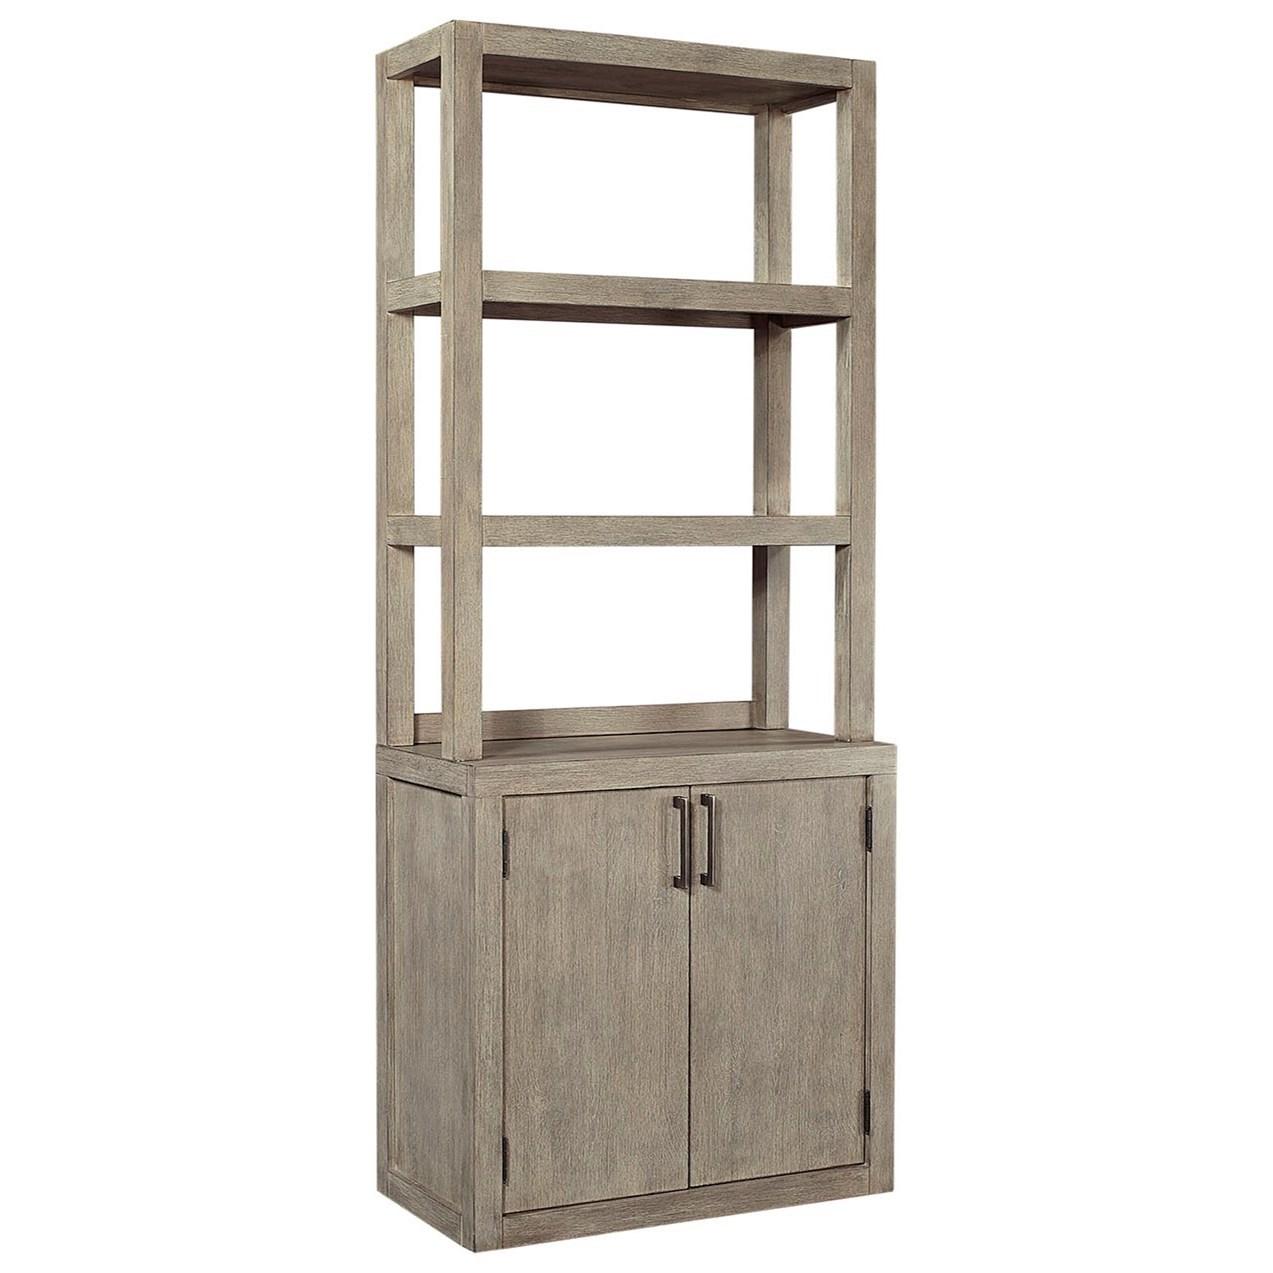 Platinum Bookcase by Aspenhome at Walker's Furniture